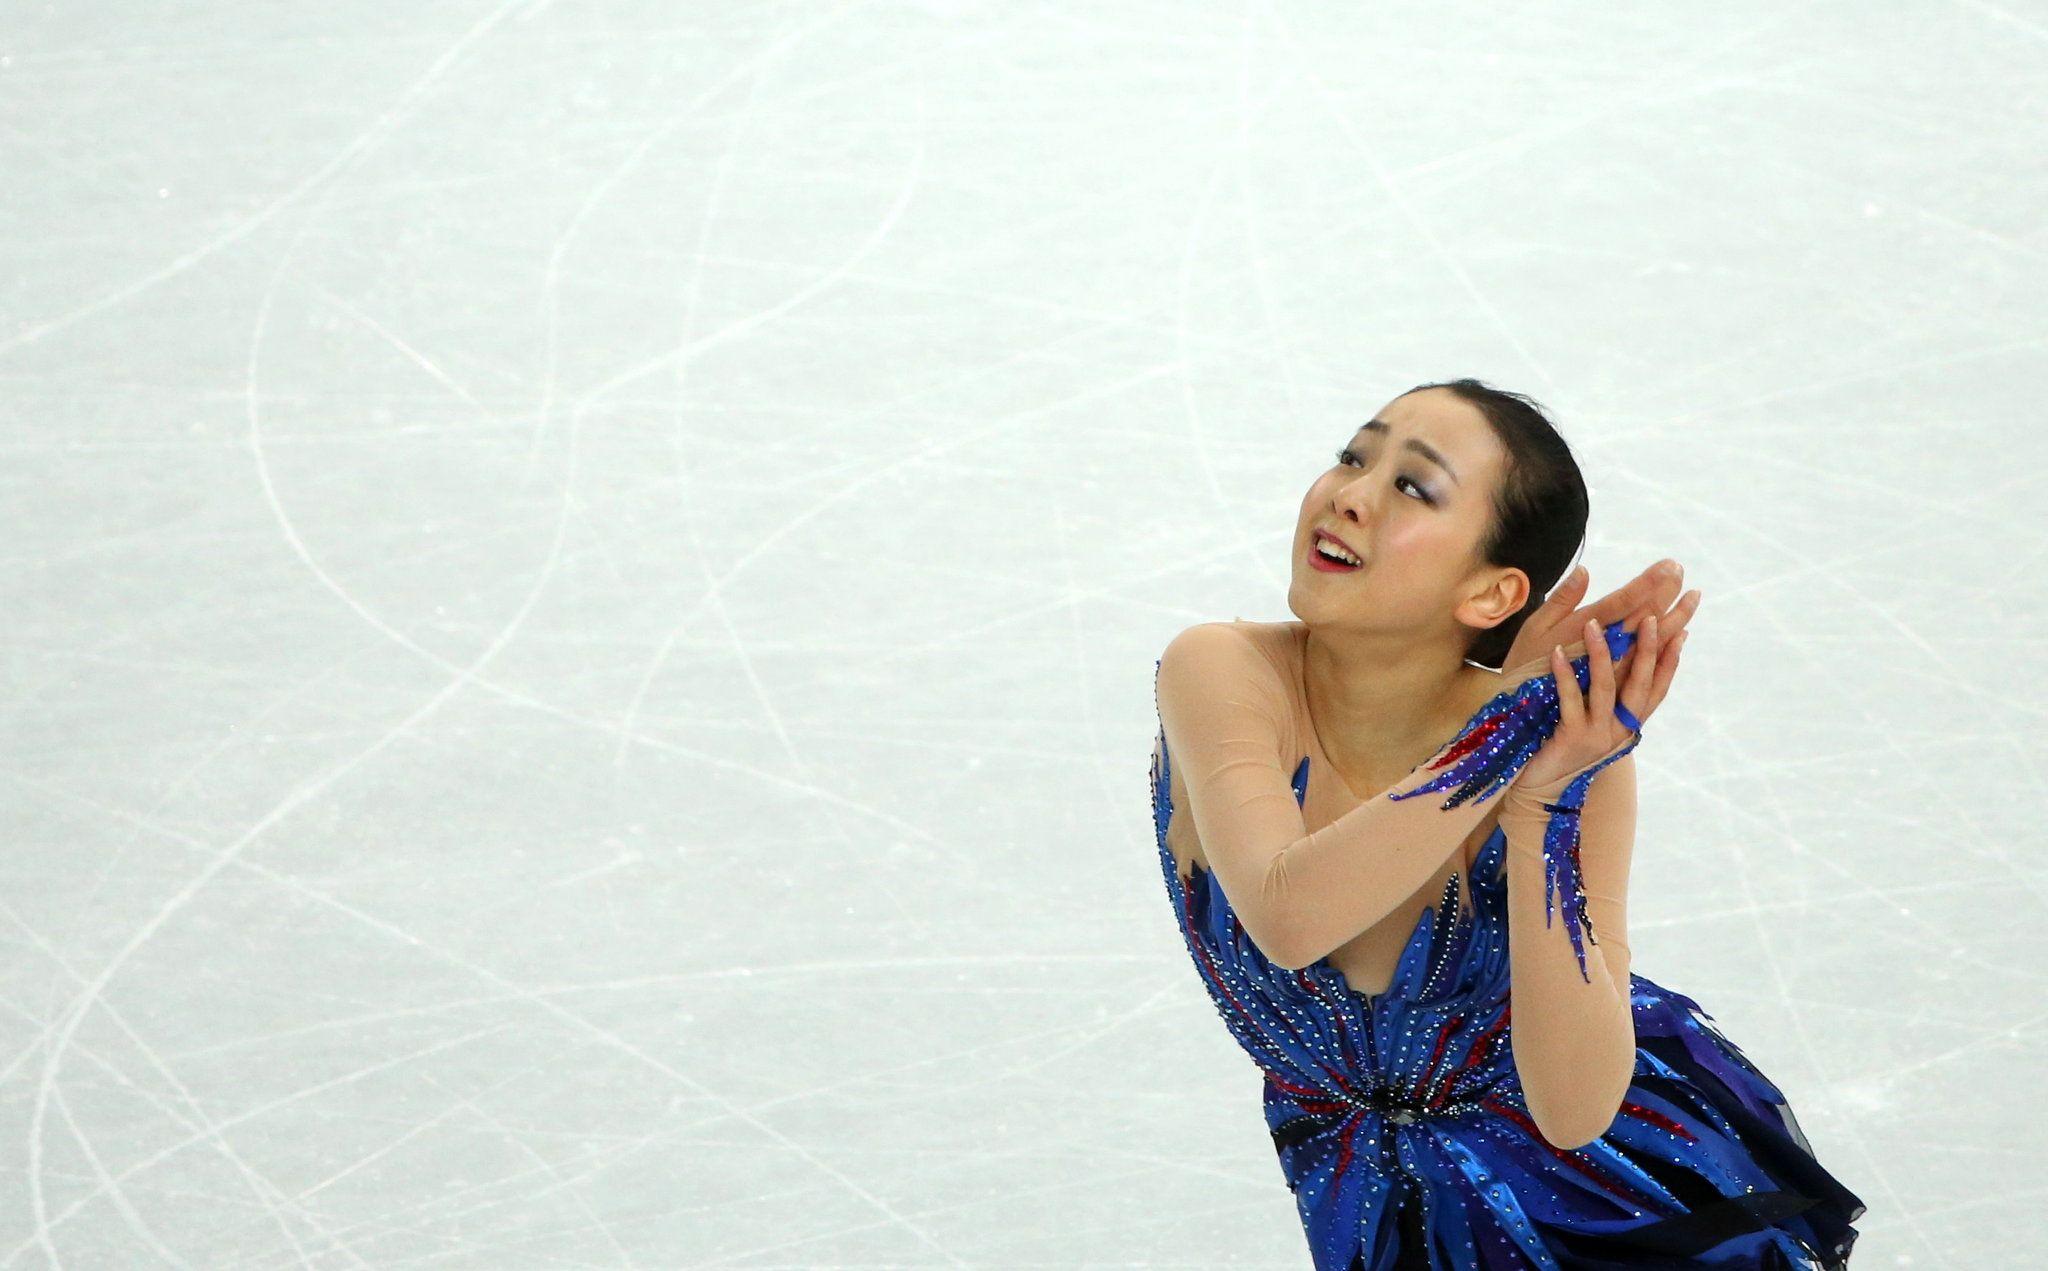 winter-olympics-japan-us-women-burma